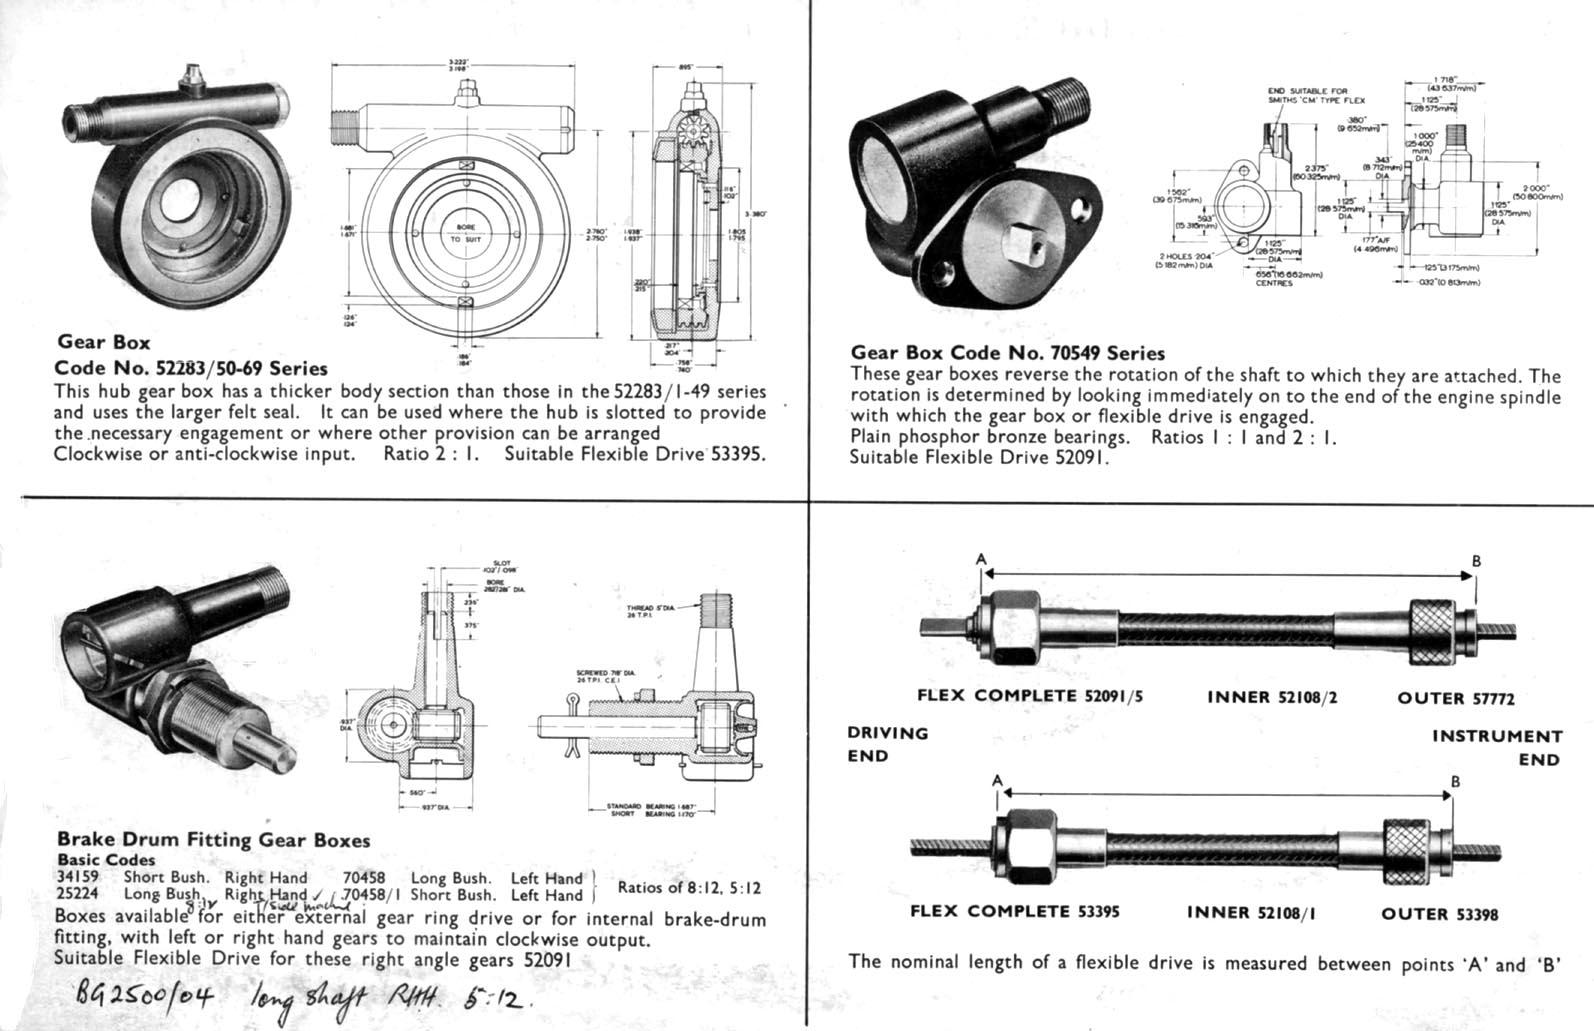 Interesting 90 Hp Honda Outboard Wiring Diagram Gallery - Best Image on johnson 70 hp wiring diagram, johnson 50 hp wiring diagram, johnson 40 hp wiring diagram,